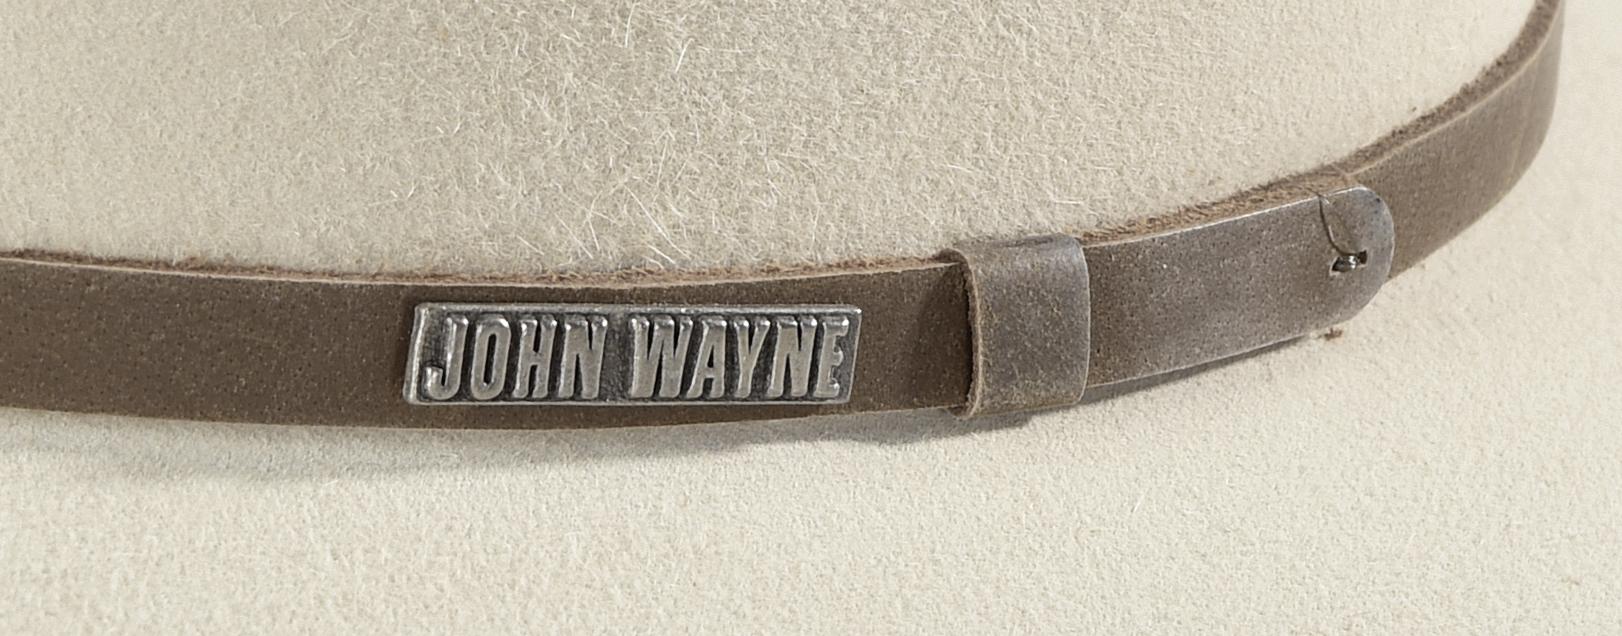 Resistol John Wayne 6X Fur Felt Duke Cowboy Hat  fb78cd3bb7a2